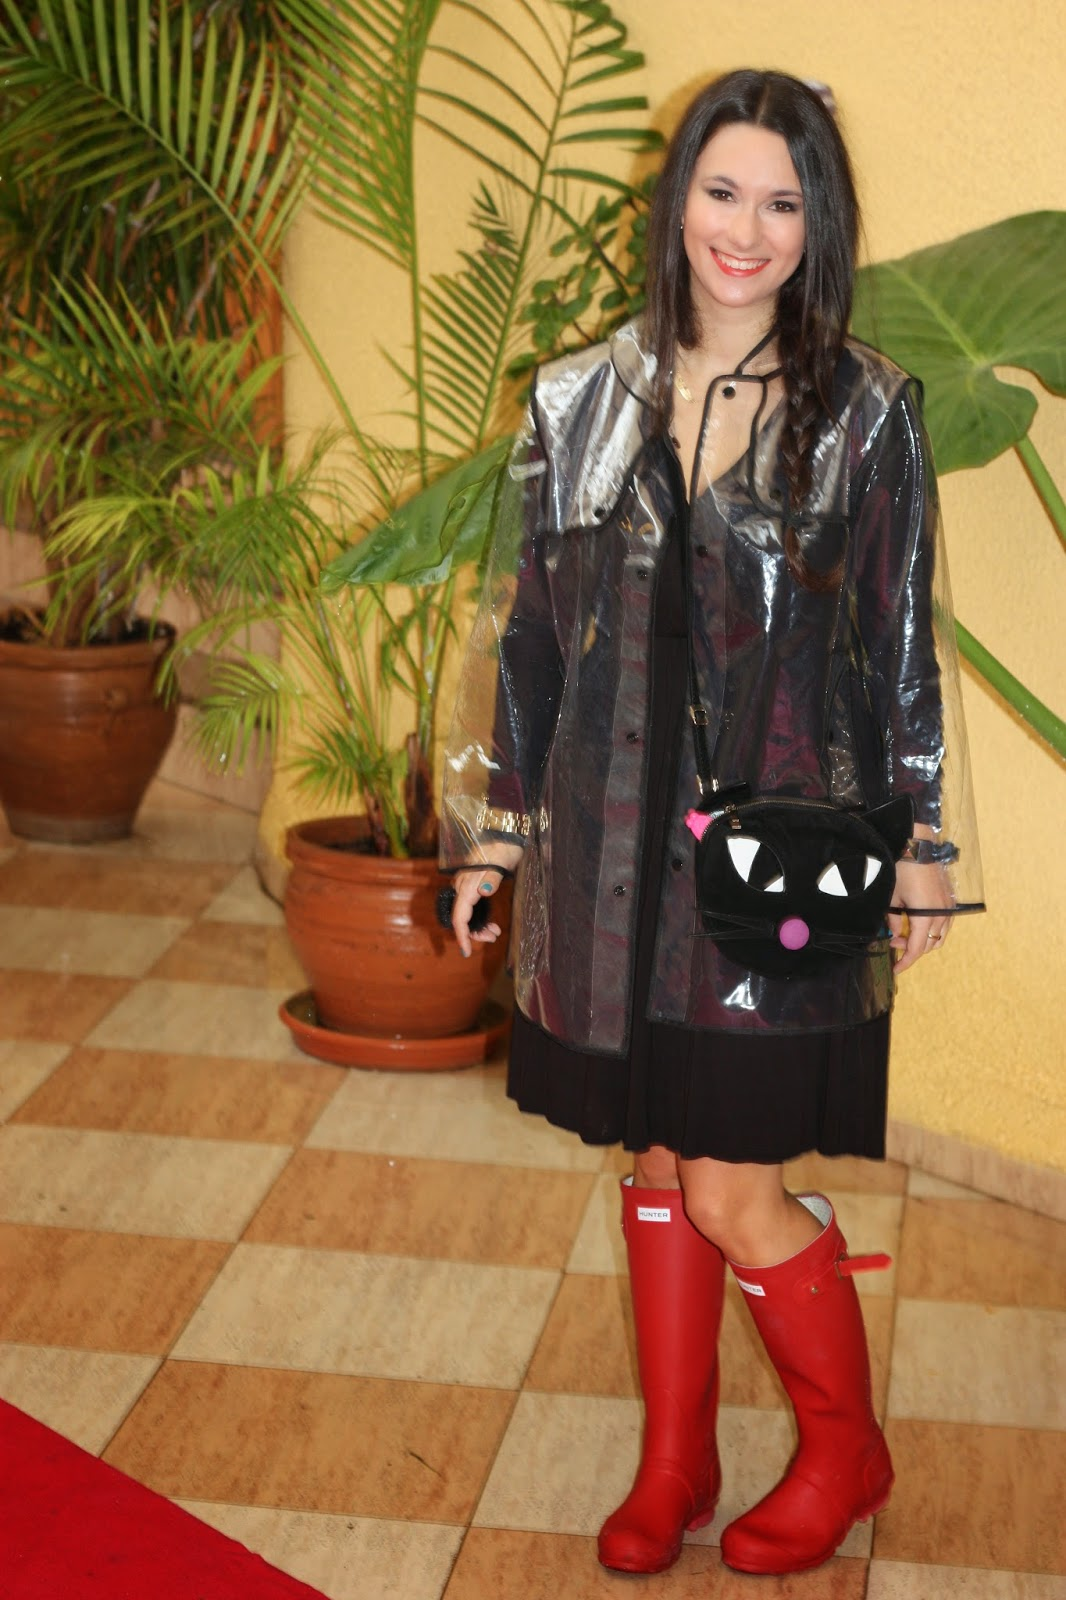 http://silviparalasamigas.blogspot.com.es/2014/12/impermeable-transparente.html